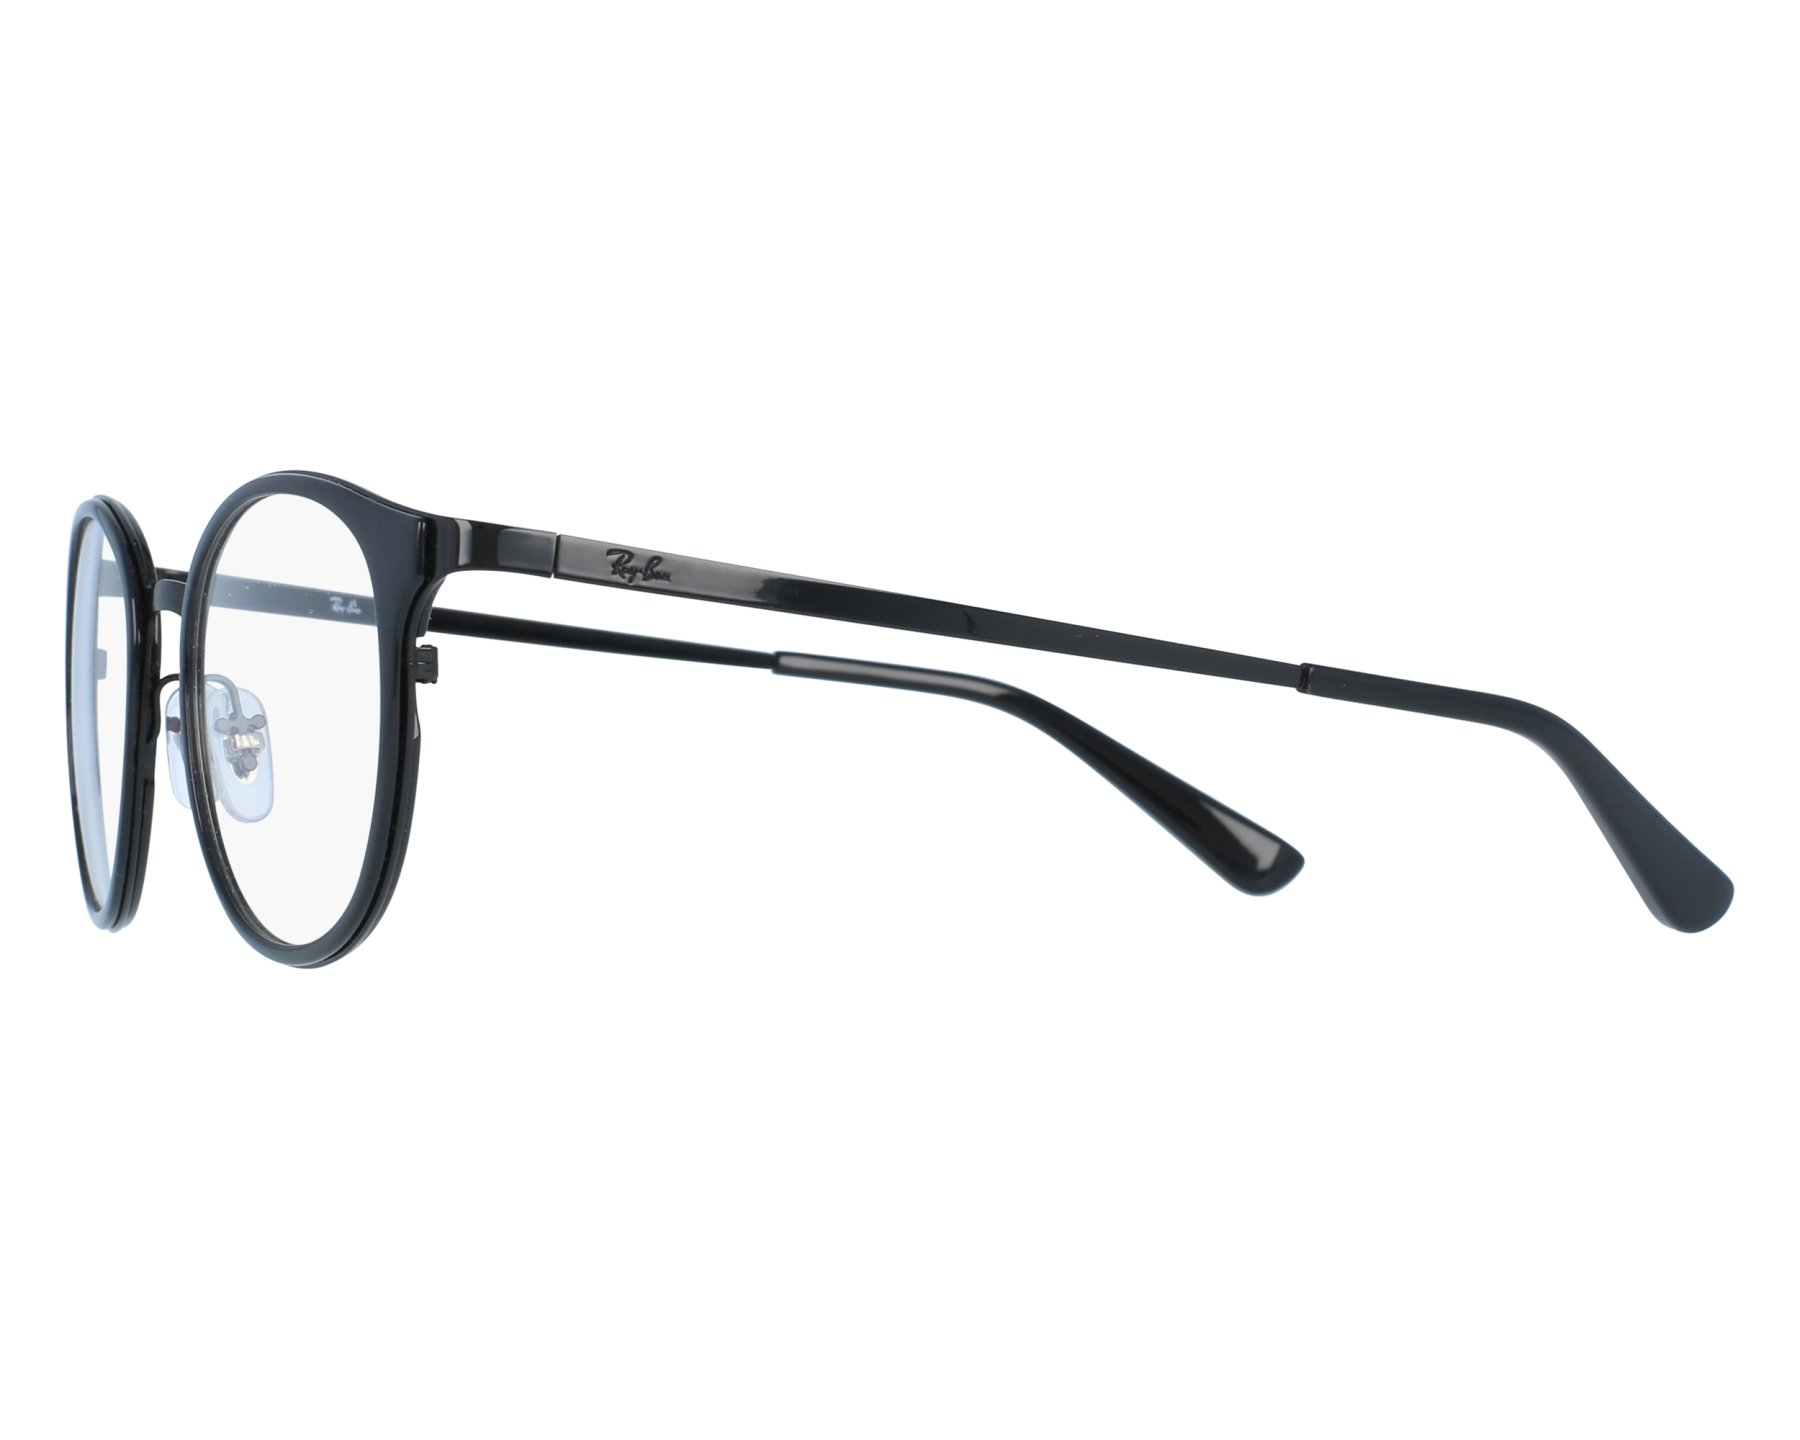 cc3ea934d22a3 eyeglasses Ray-Ban RX-6372-M 2509 50-19 Black front view